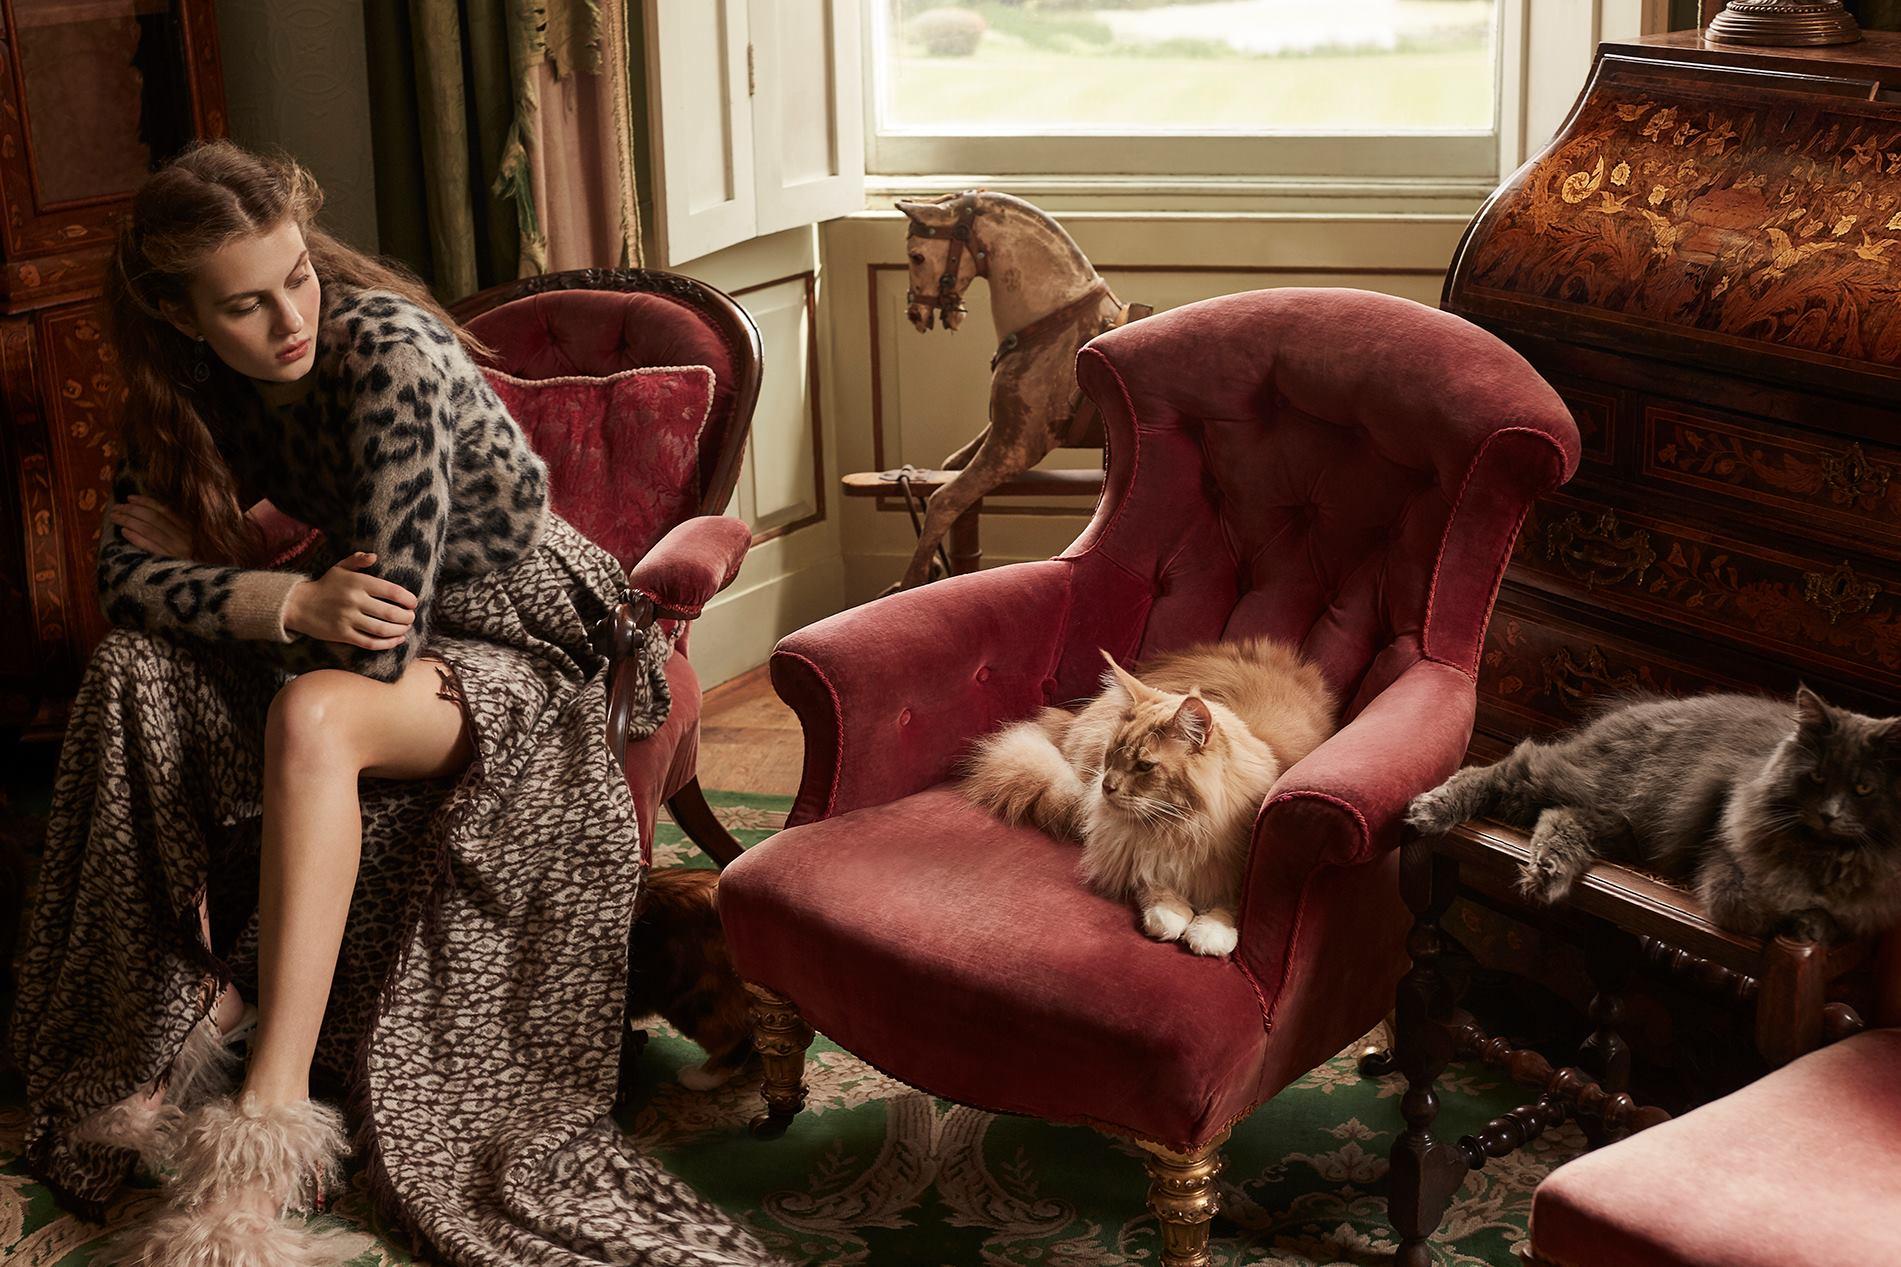 джемпер из мохера, юбка из шерсти, Max Mara; серьги с кристаллами, Atelier Swarovski by Tabitha Simmons;  босоножки с мехом барашка, Preen by Thornton Bregazzi